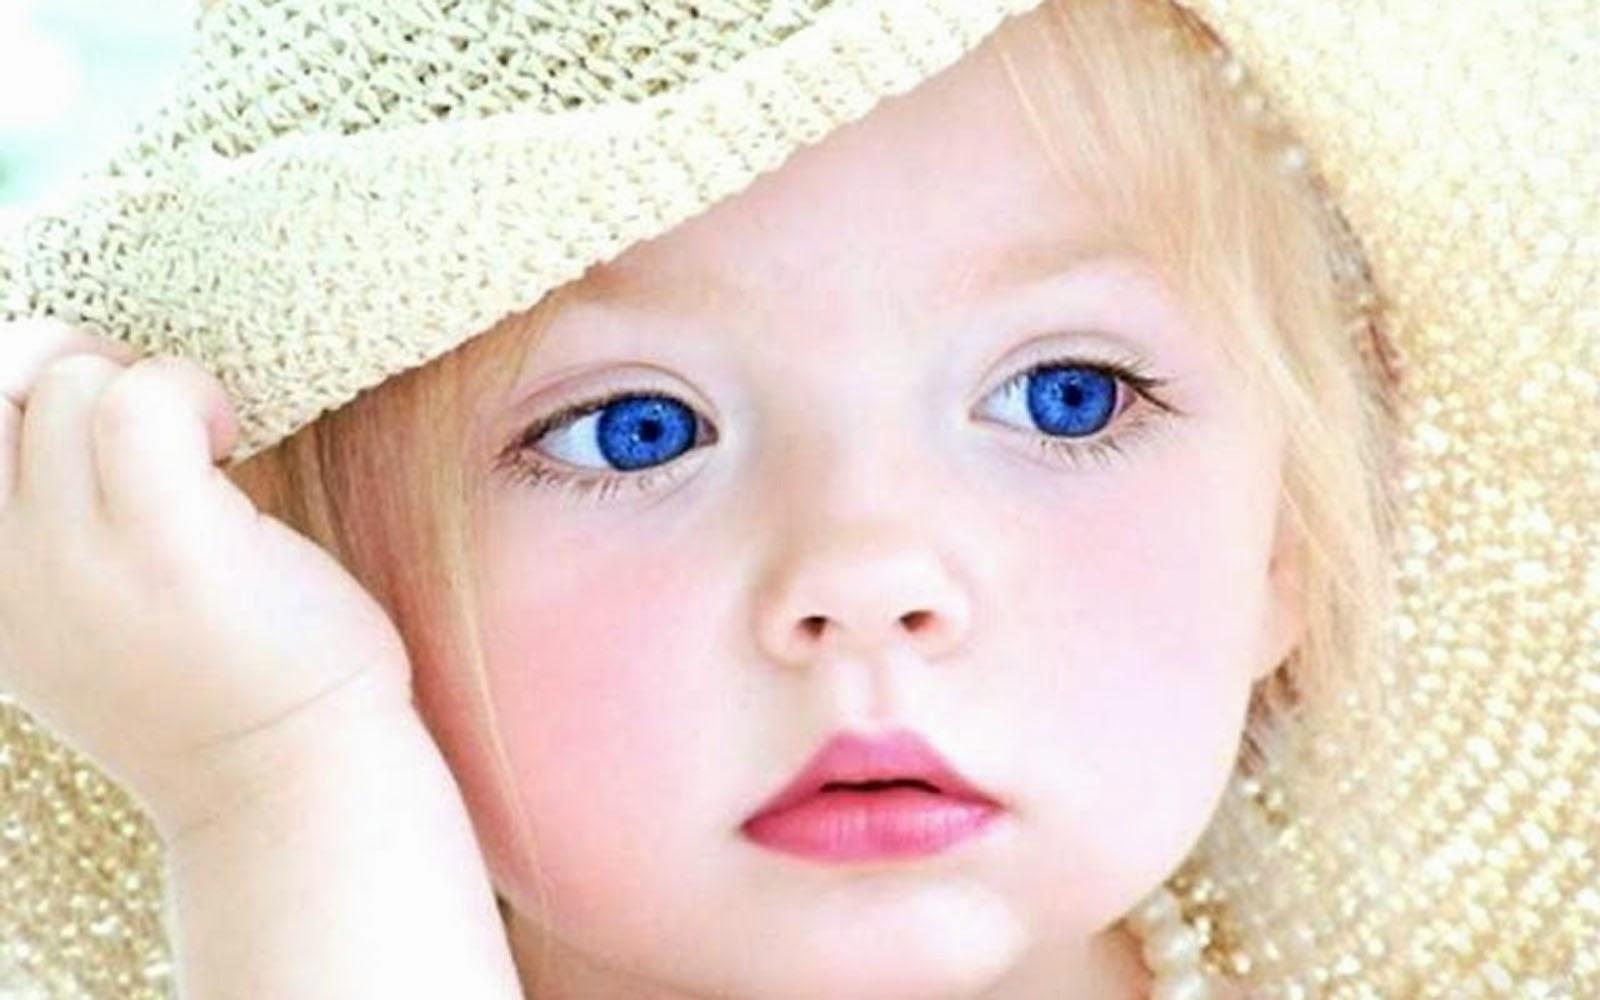 Cute Baby Wallpapers HD Free - beautiful desktop ... - photo#42